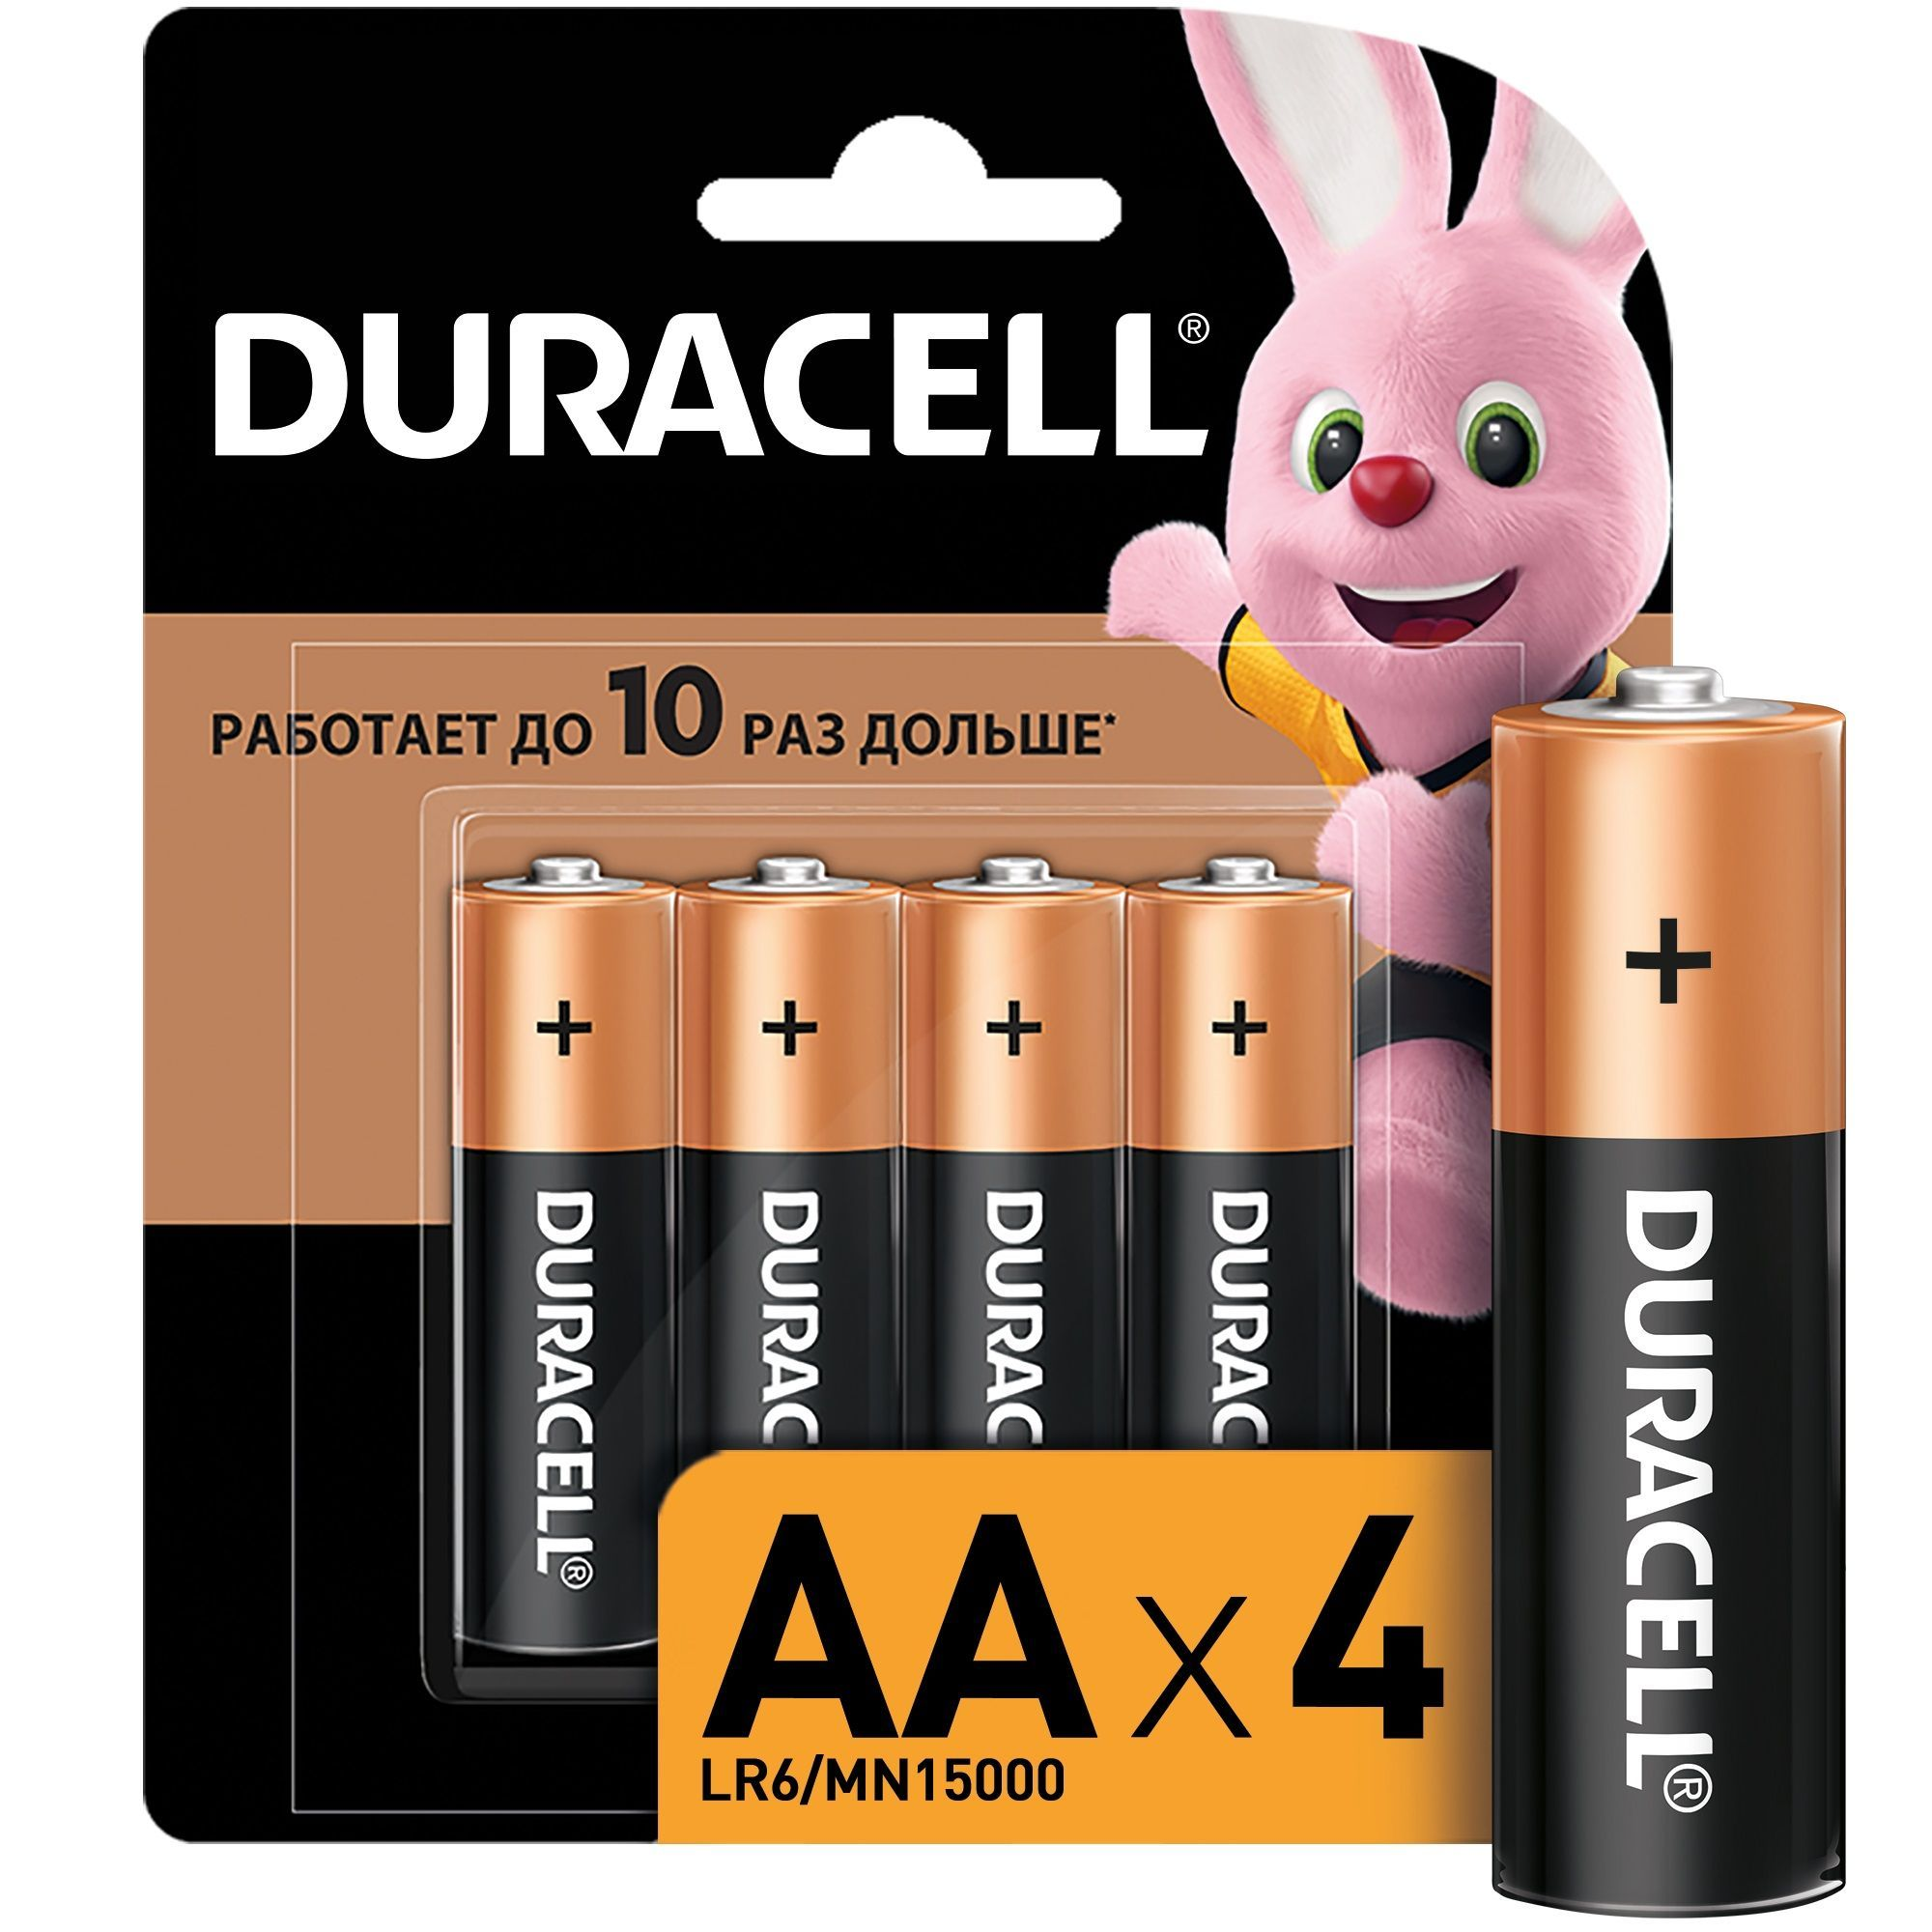 Батарейки DURACELL AA алкалиновая 1,50 V 4 шт/упак